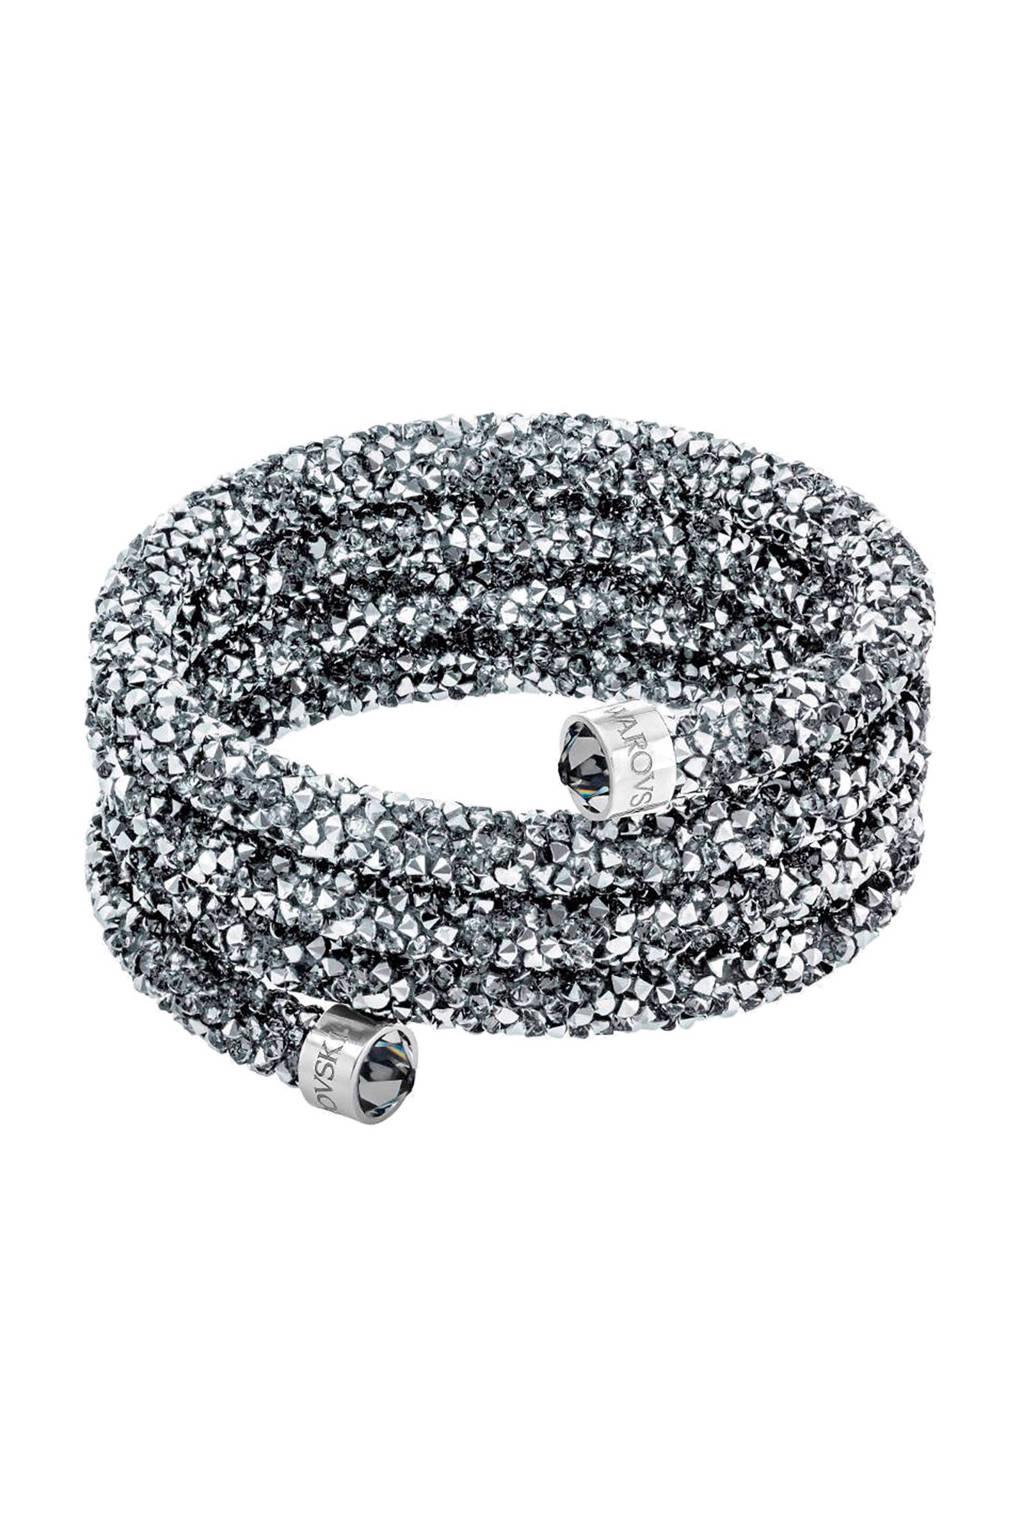 Swarovski armband - 5277588, Grijs/transparant